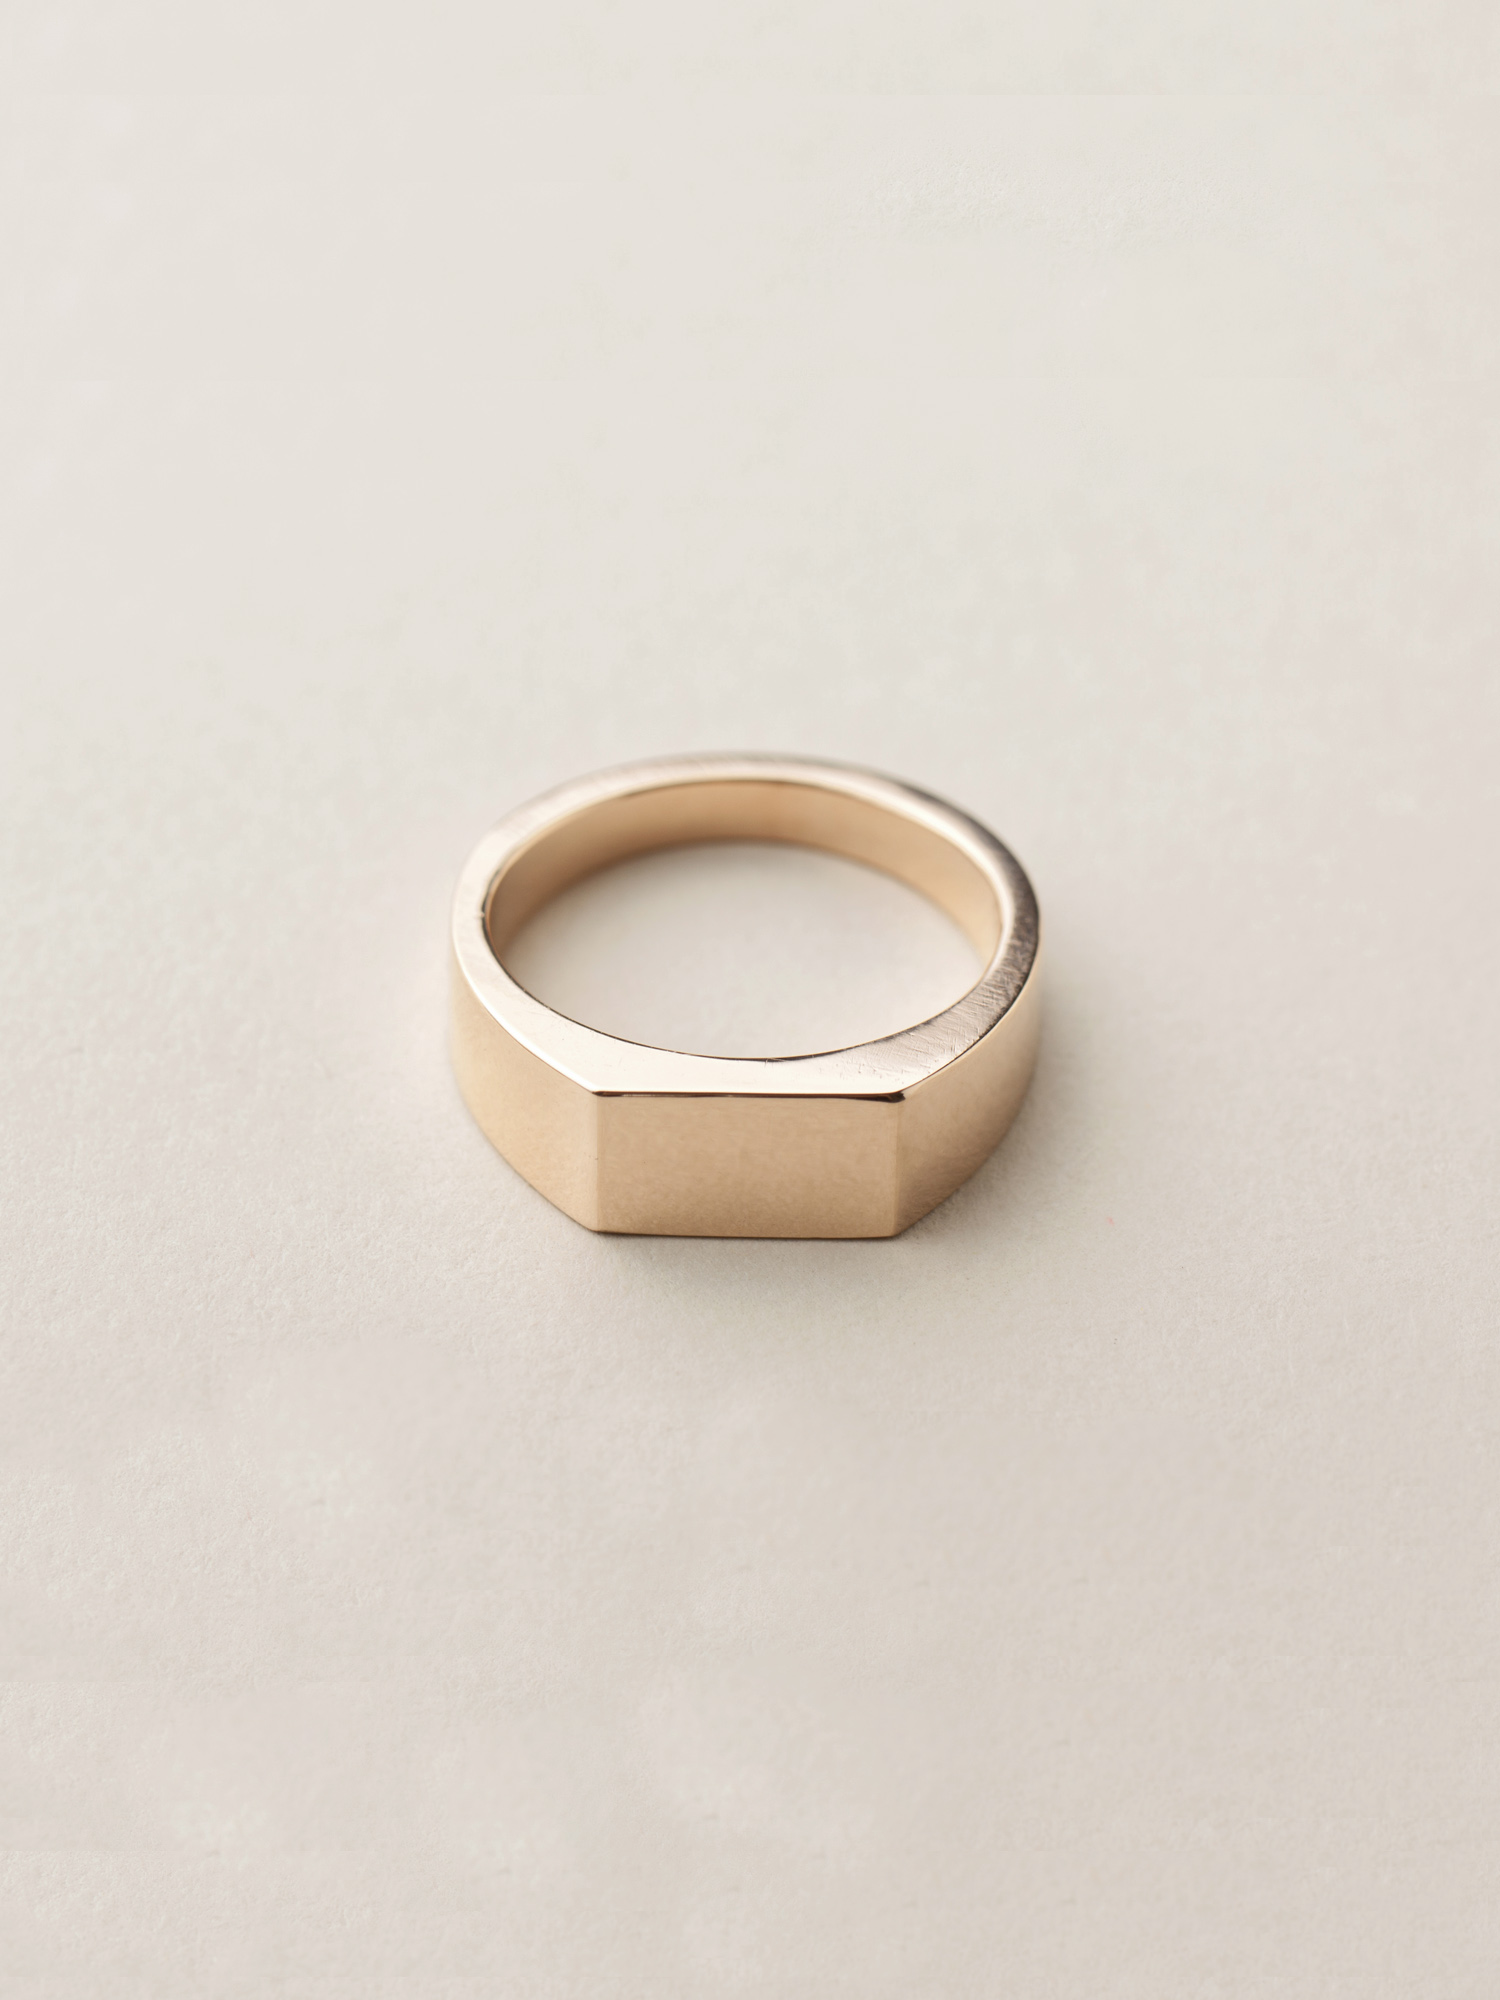 Siegelring Minima, mittel rechteckig in 585 Rosegold  Signet ring Minima, medium rectangle in 14ct rose gold